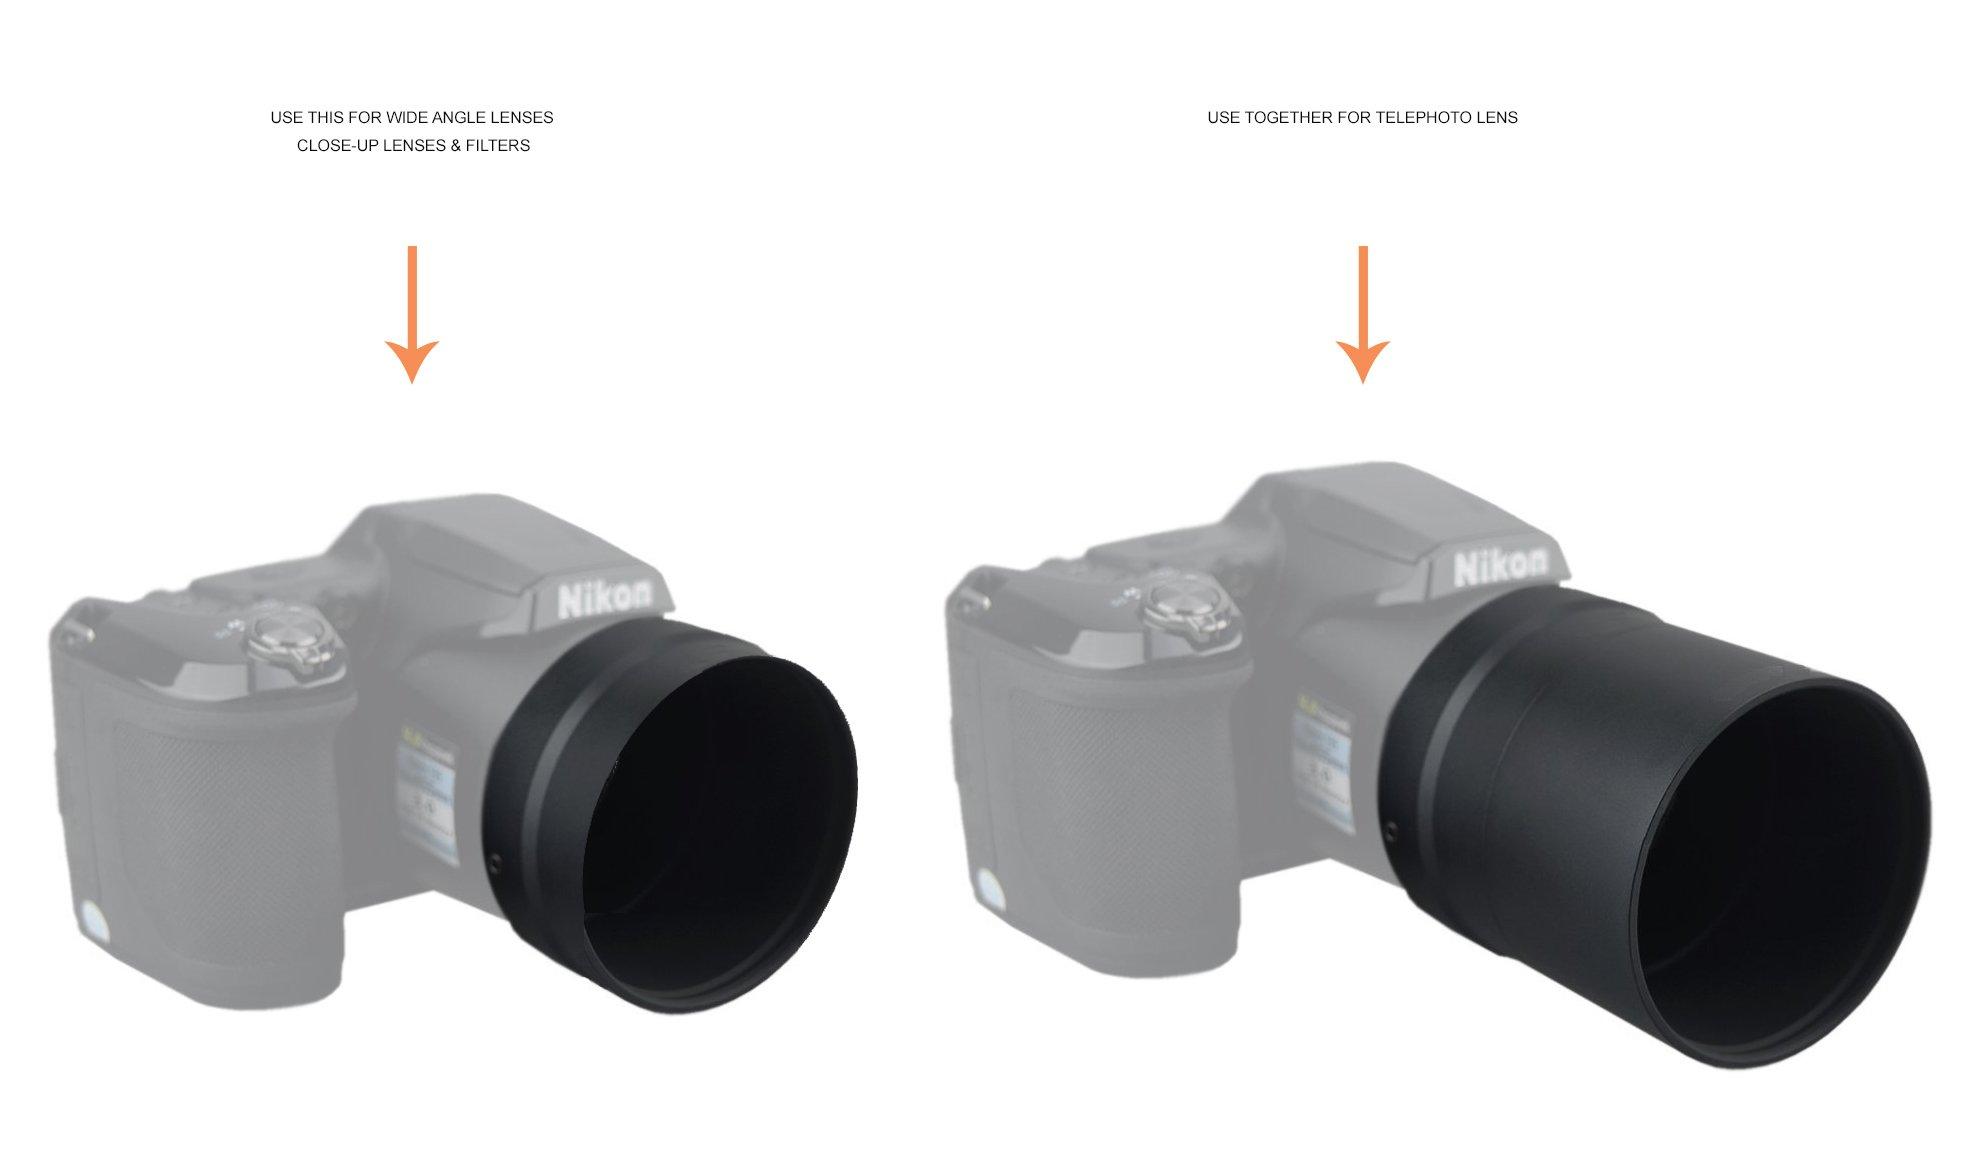 Nikon COOLPIX L820 10x High Definition 2 Element Close-Up (Macro) Lens (Inclu. by Digital Nc